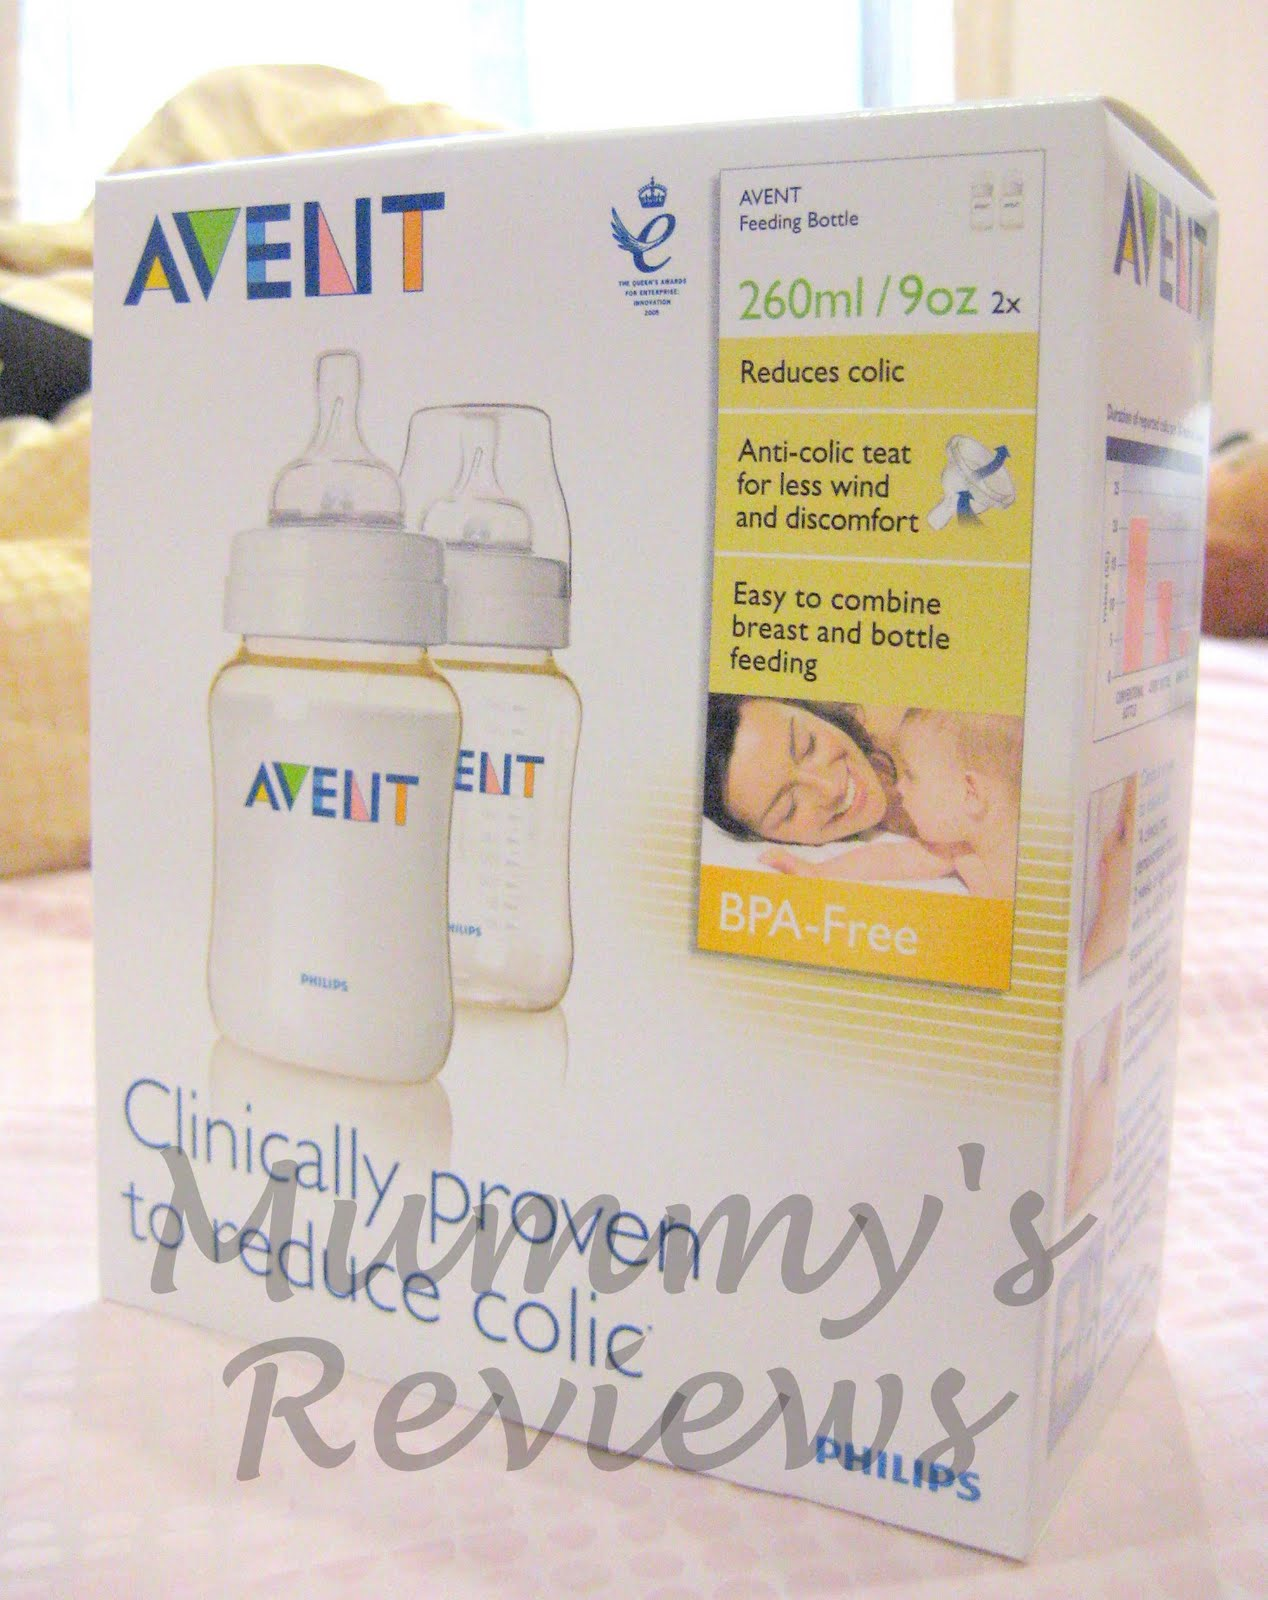 AVENT BPA-Free Feeding Bottles